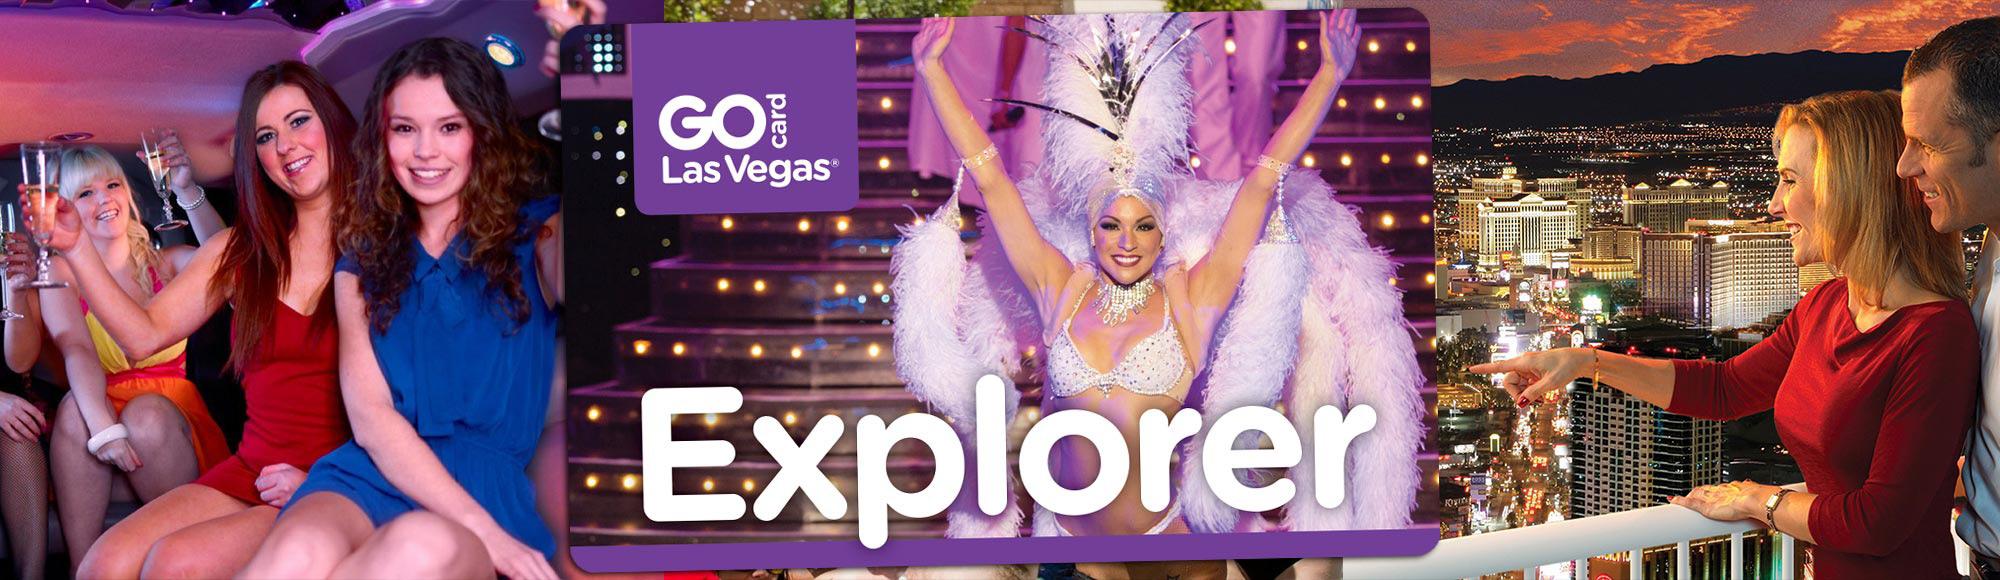 Las Vegas Explorer Pass attraction